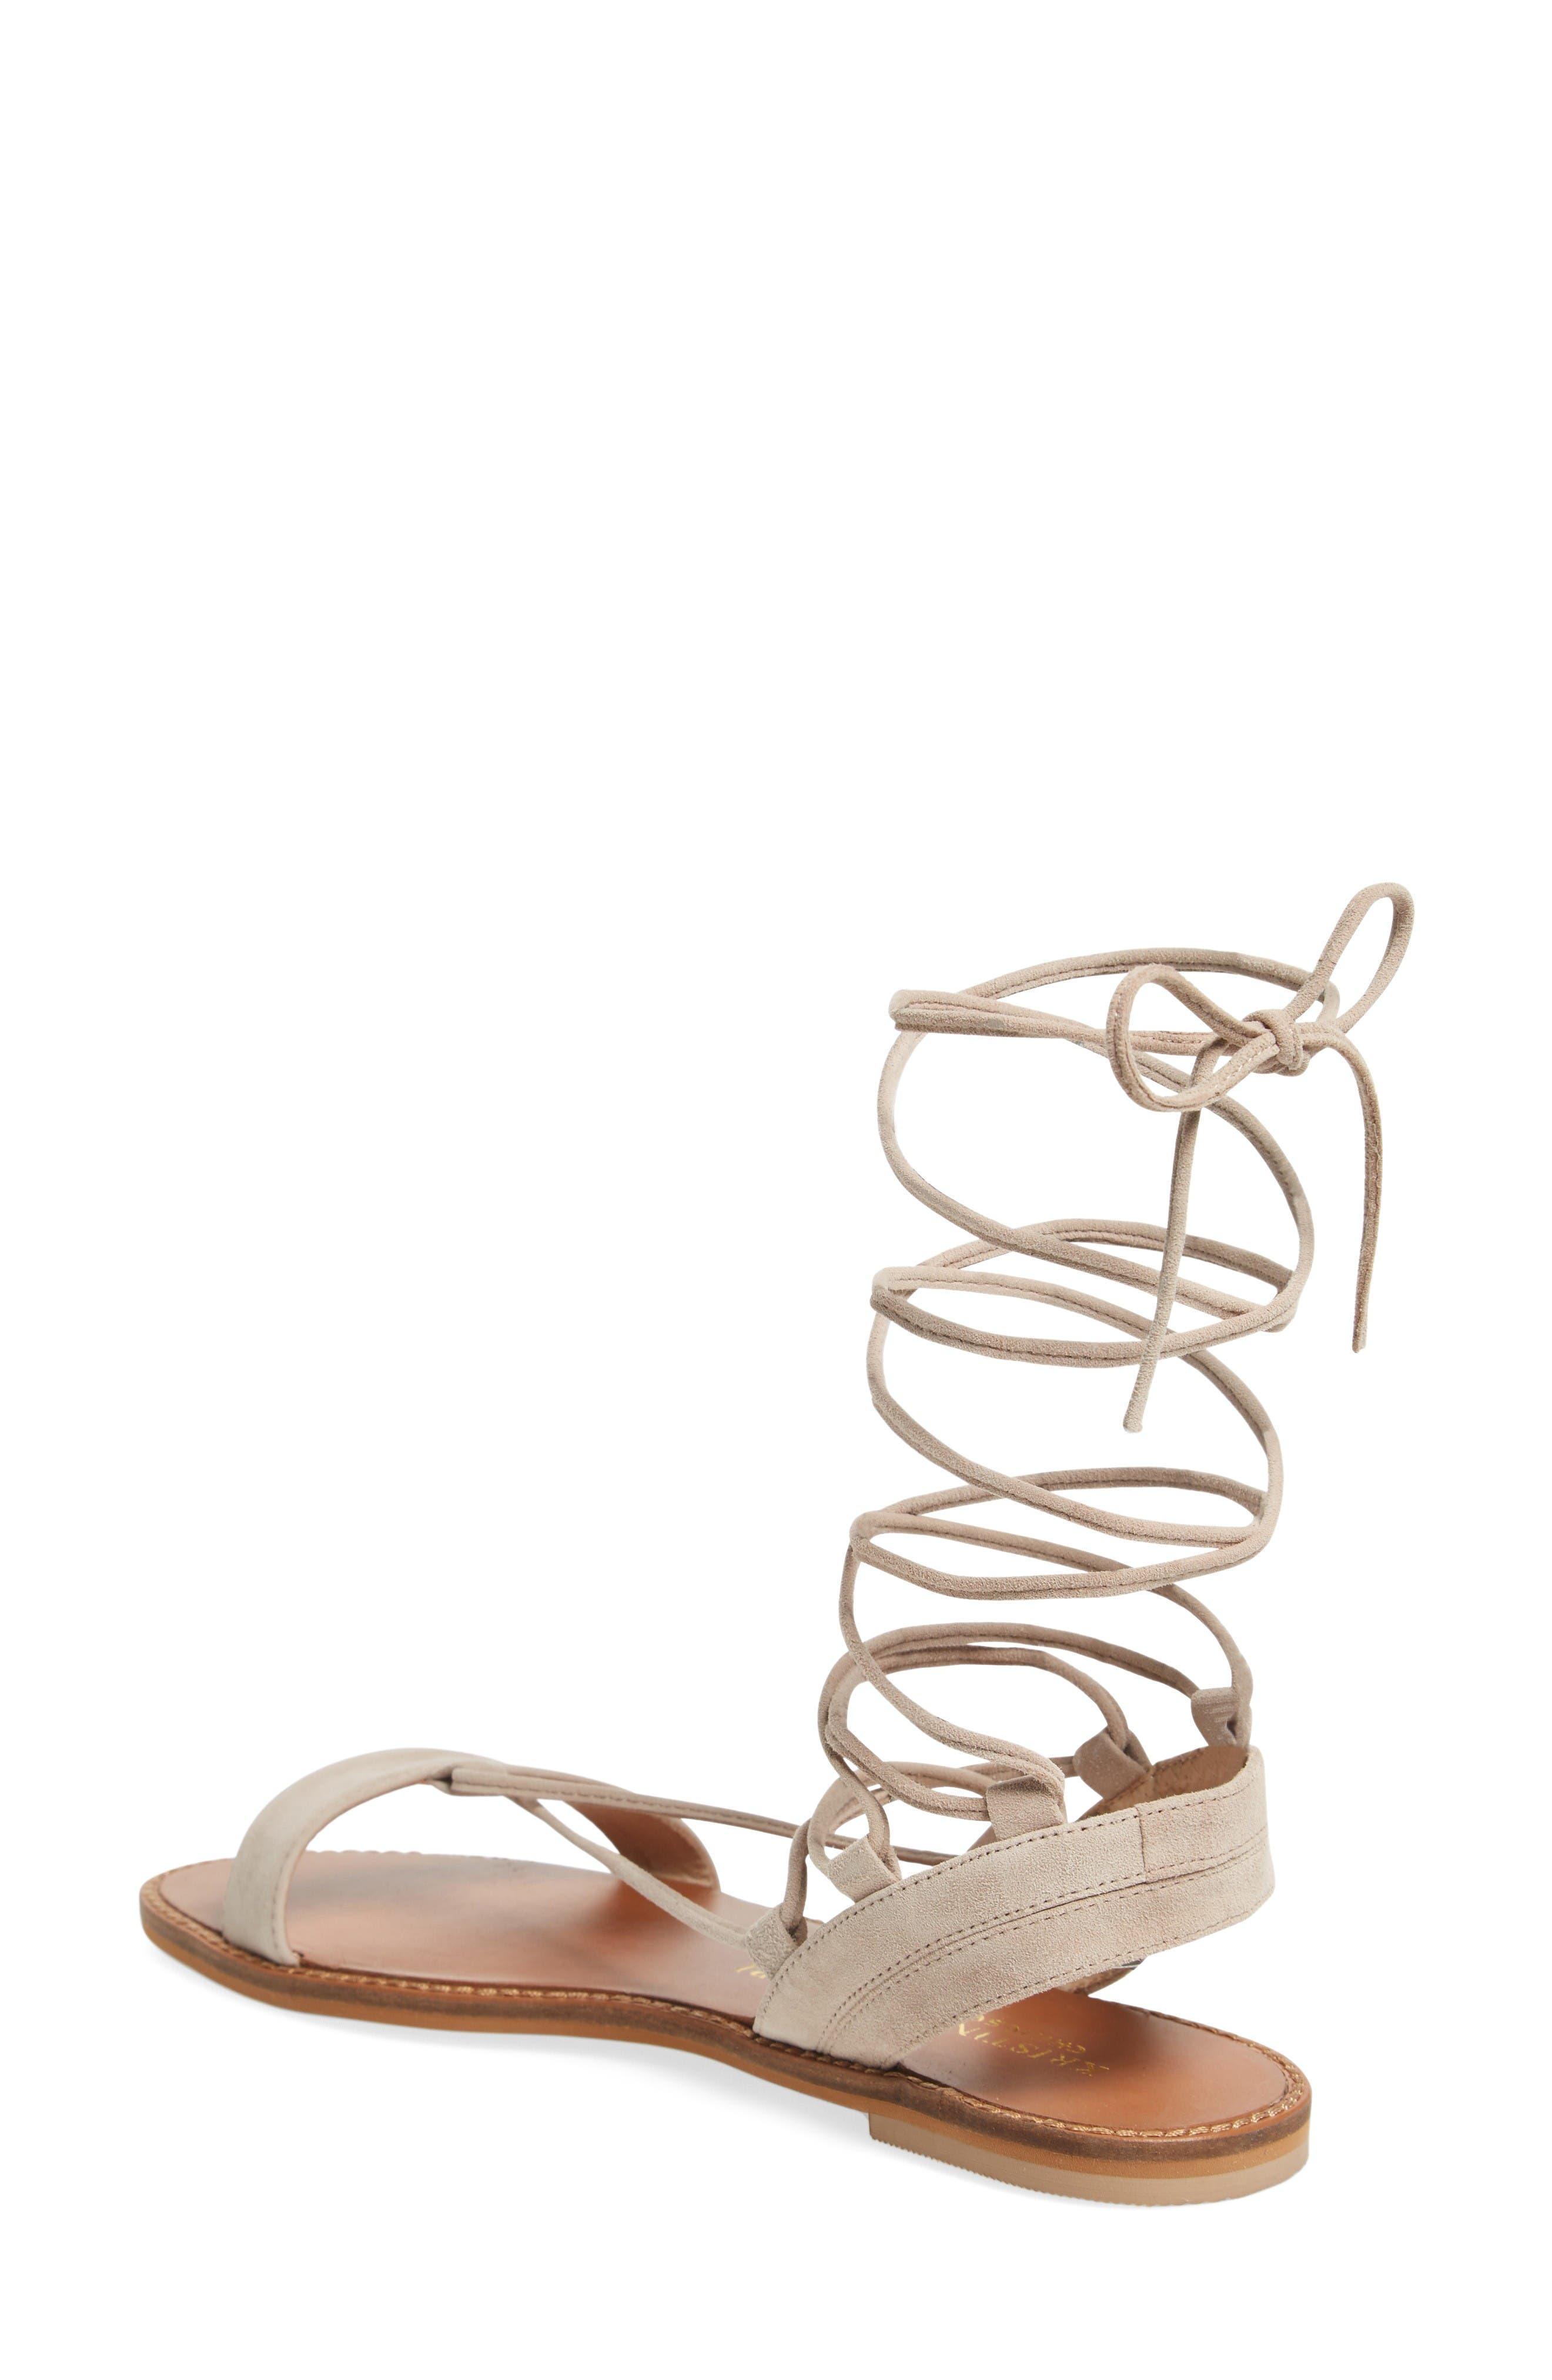 Brea Ankle Wrap Sandal,                             Alternate thumbnail 2, color,                             Mushroom